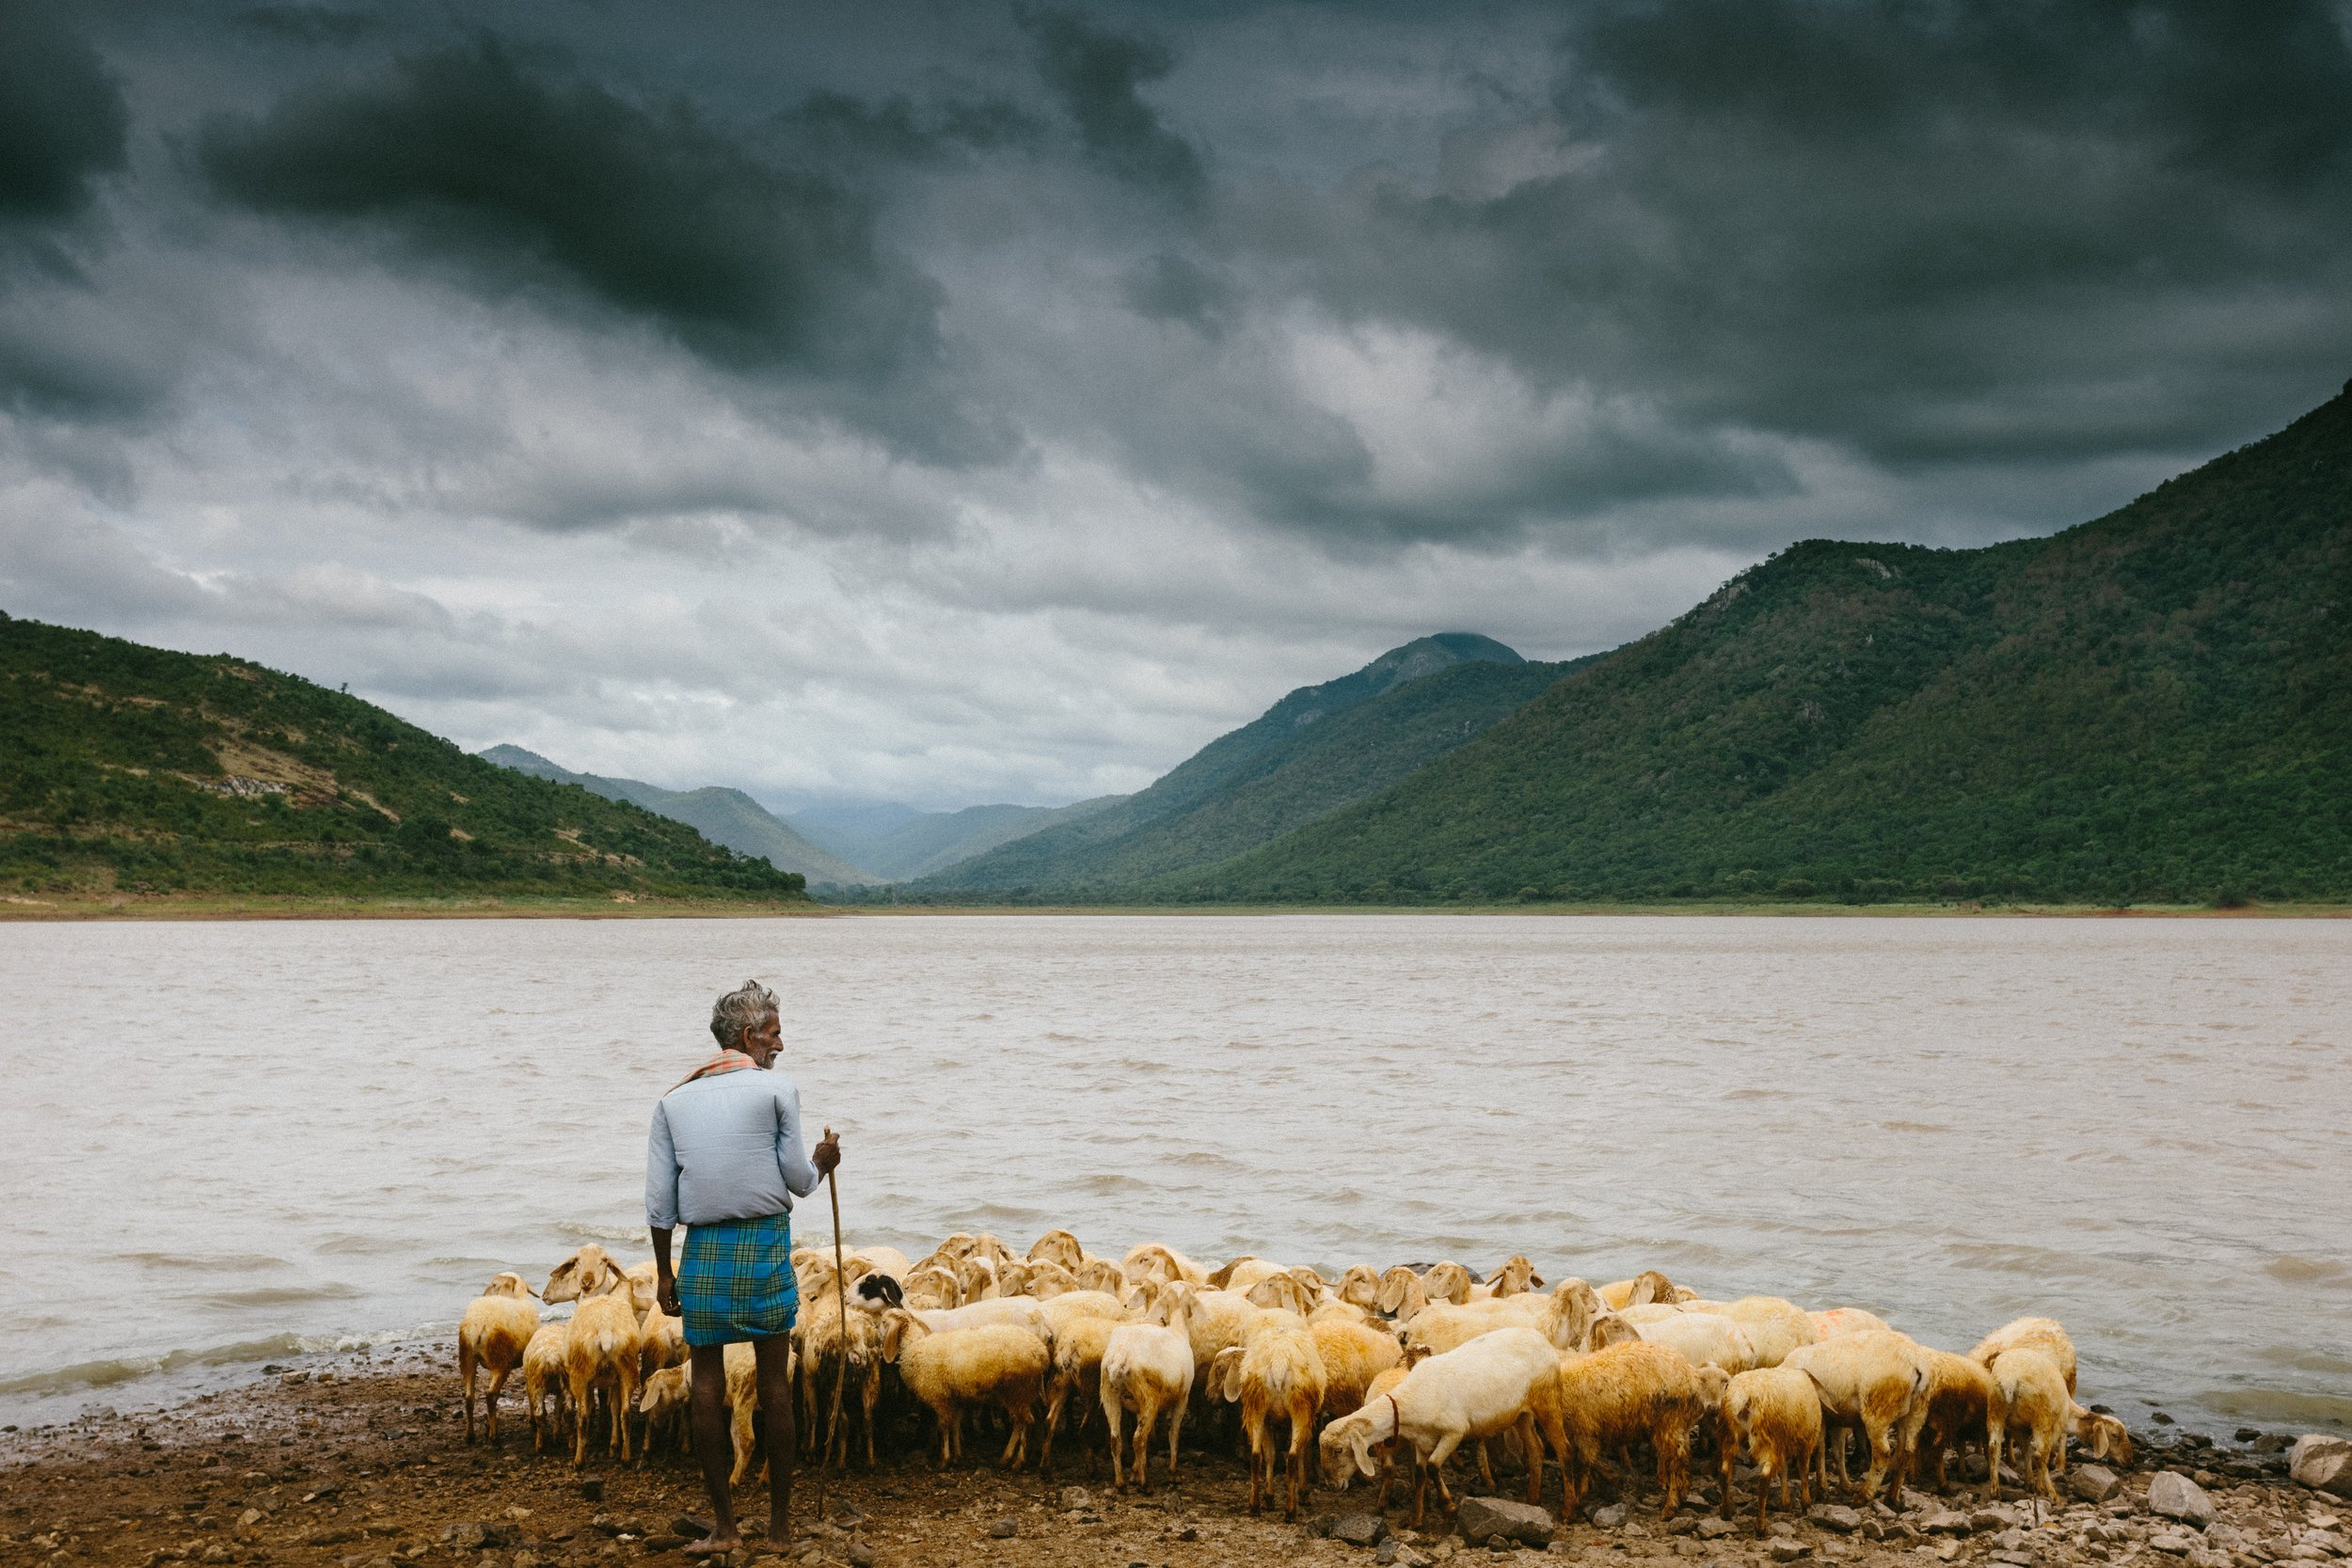 Photo by  joseph d'mello on  Unsplash